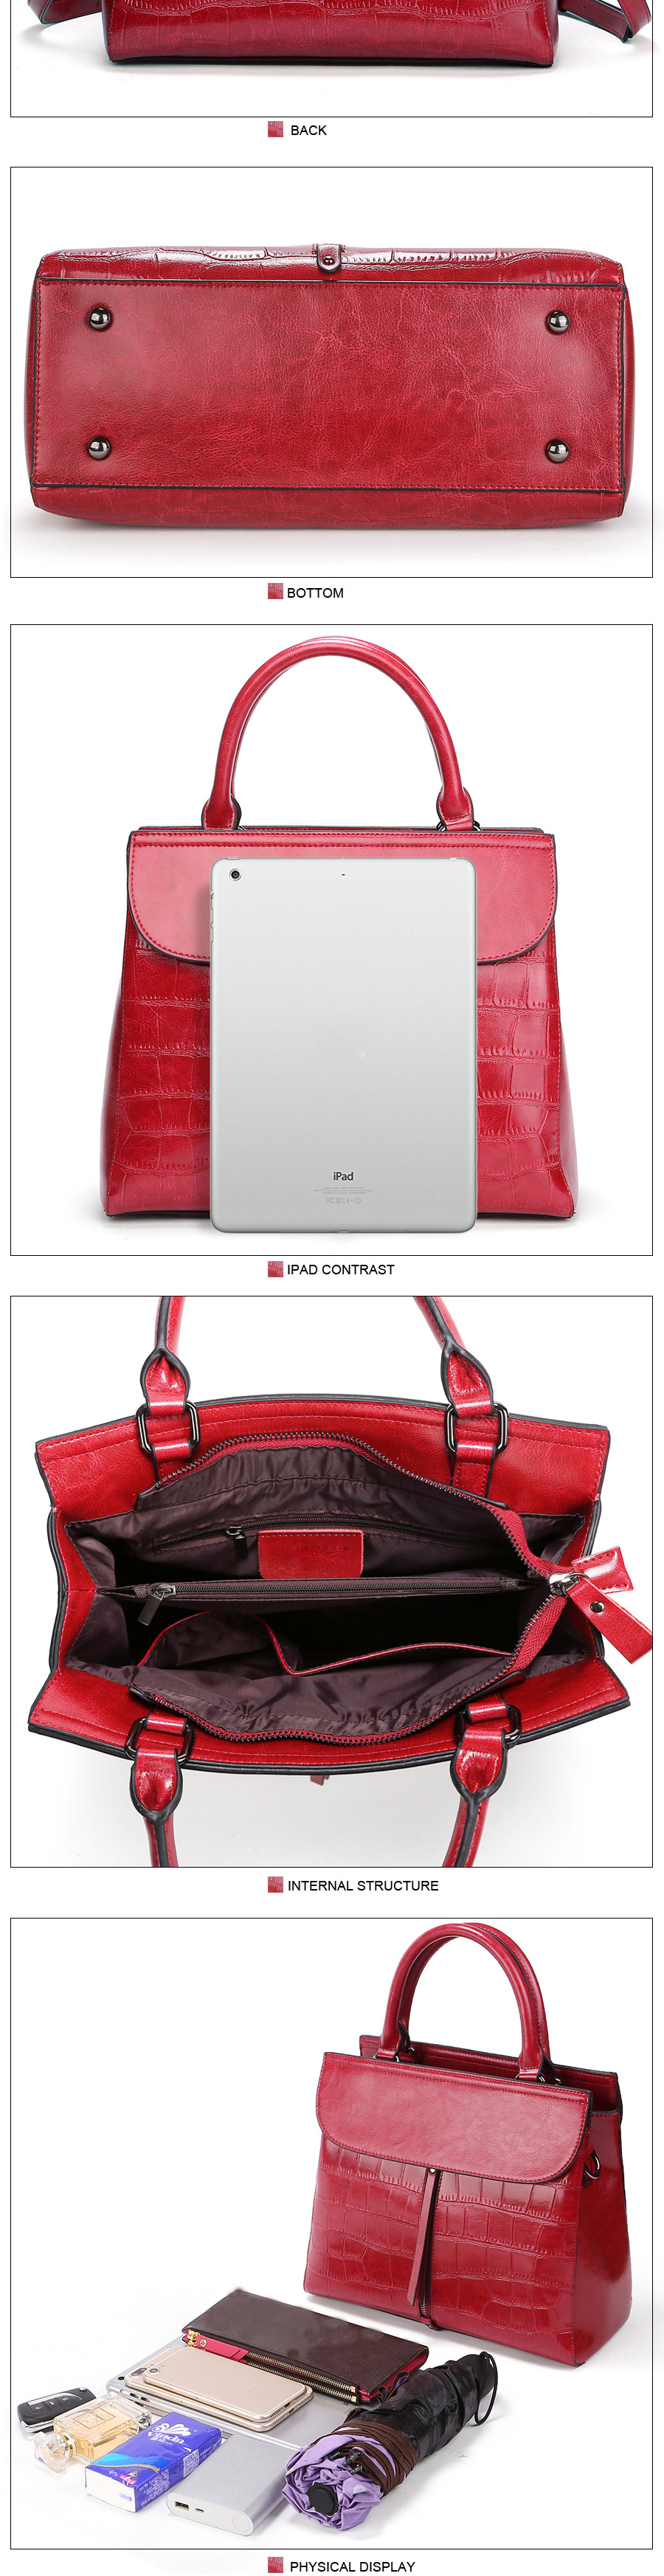 900woman-handbag3_02